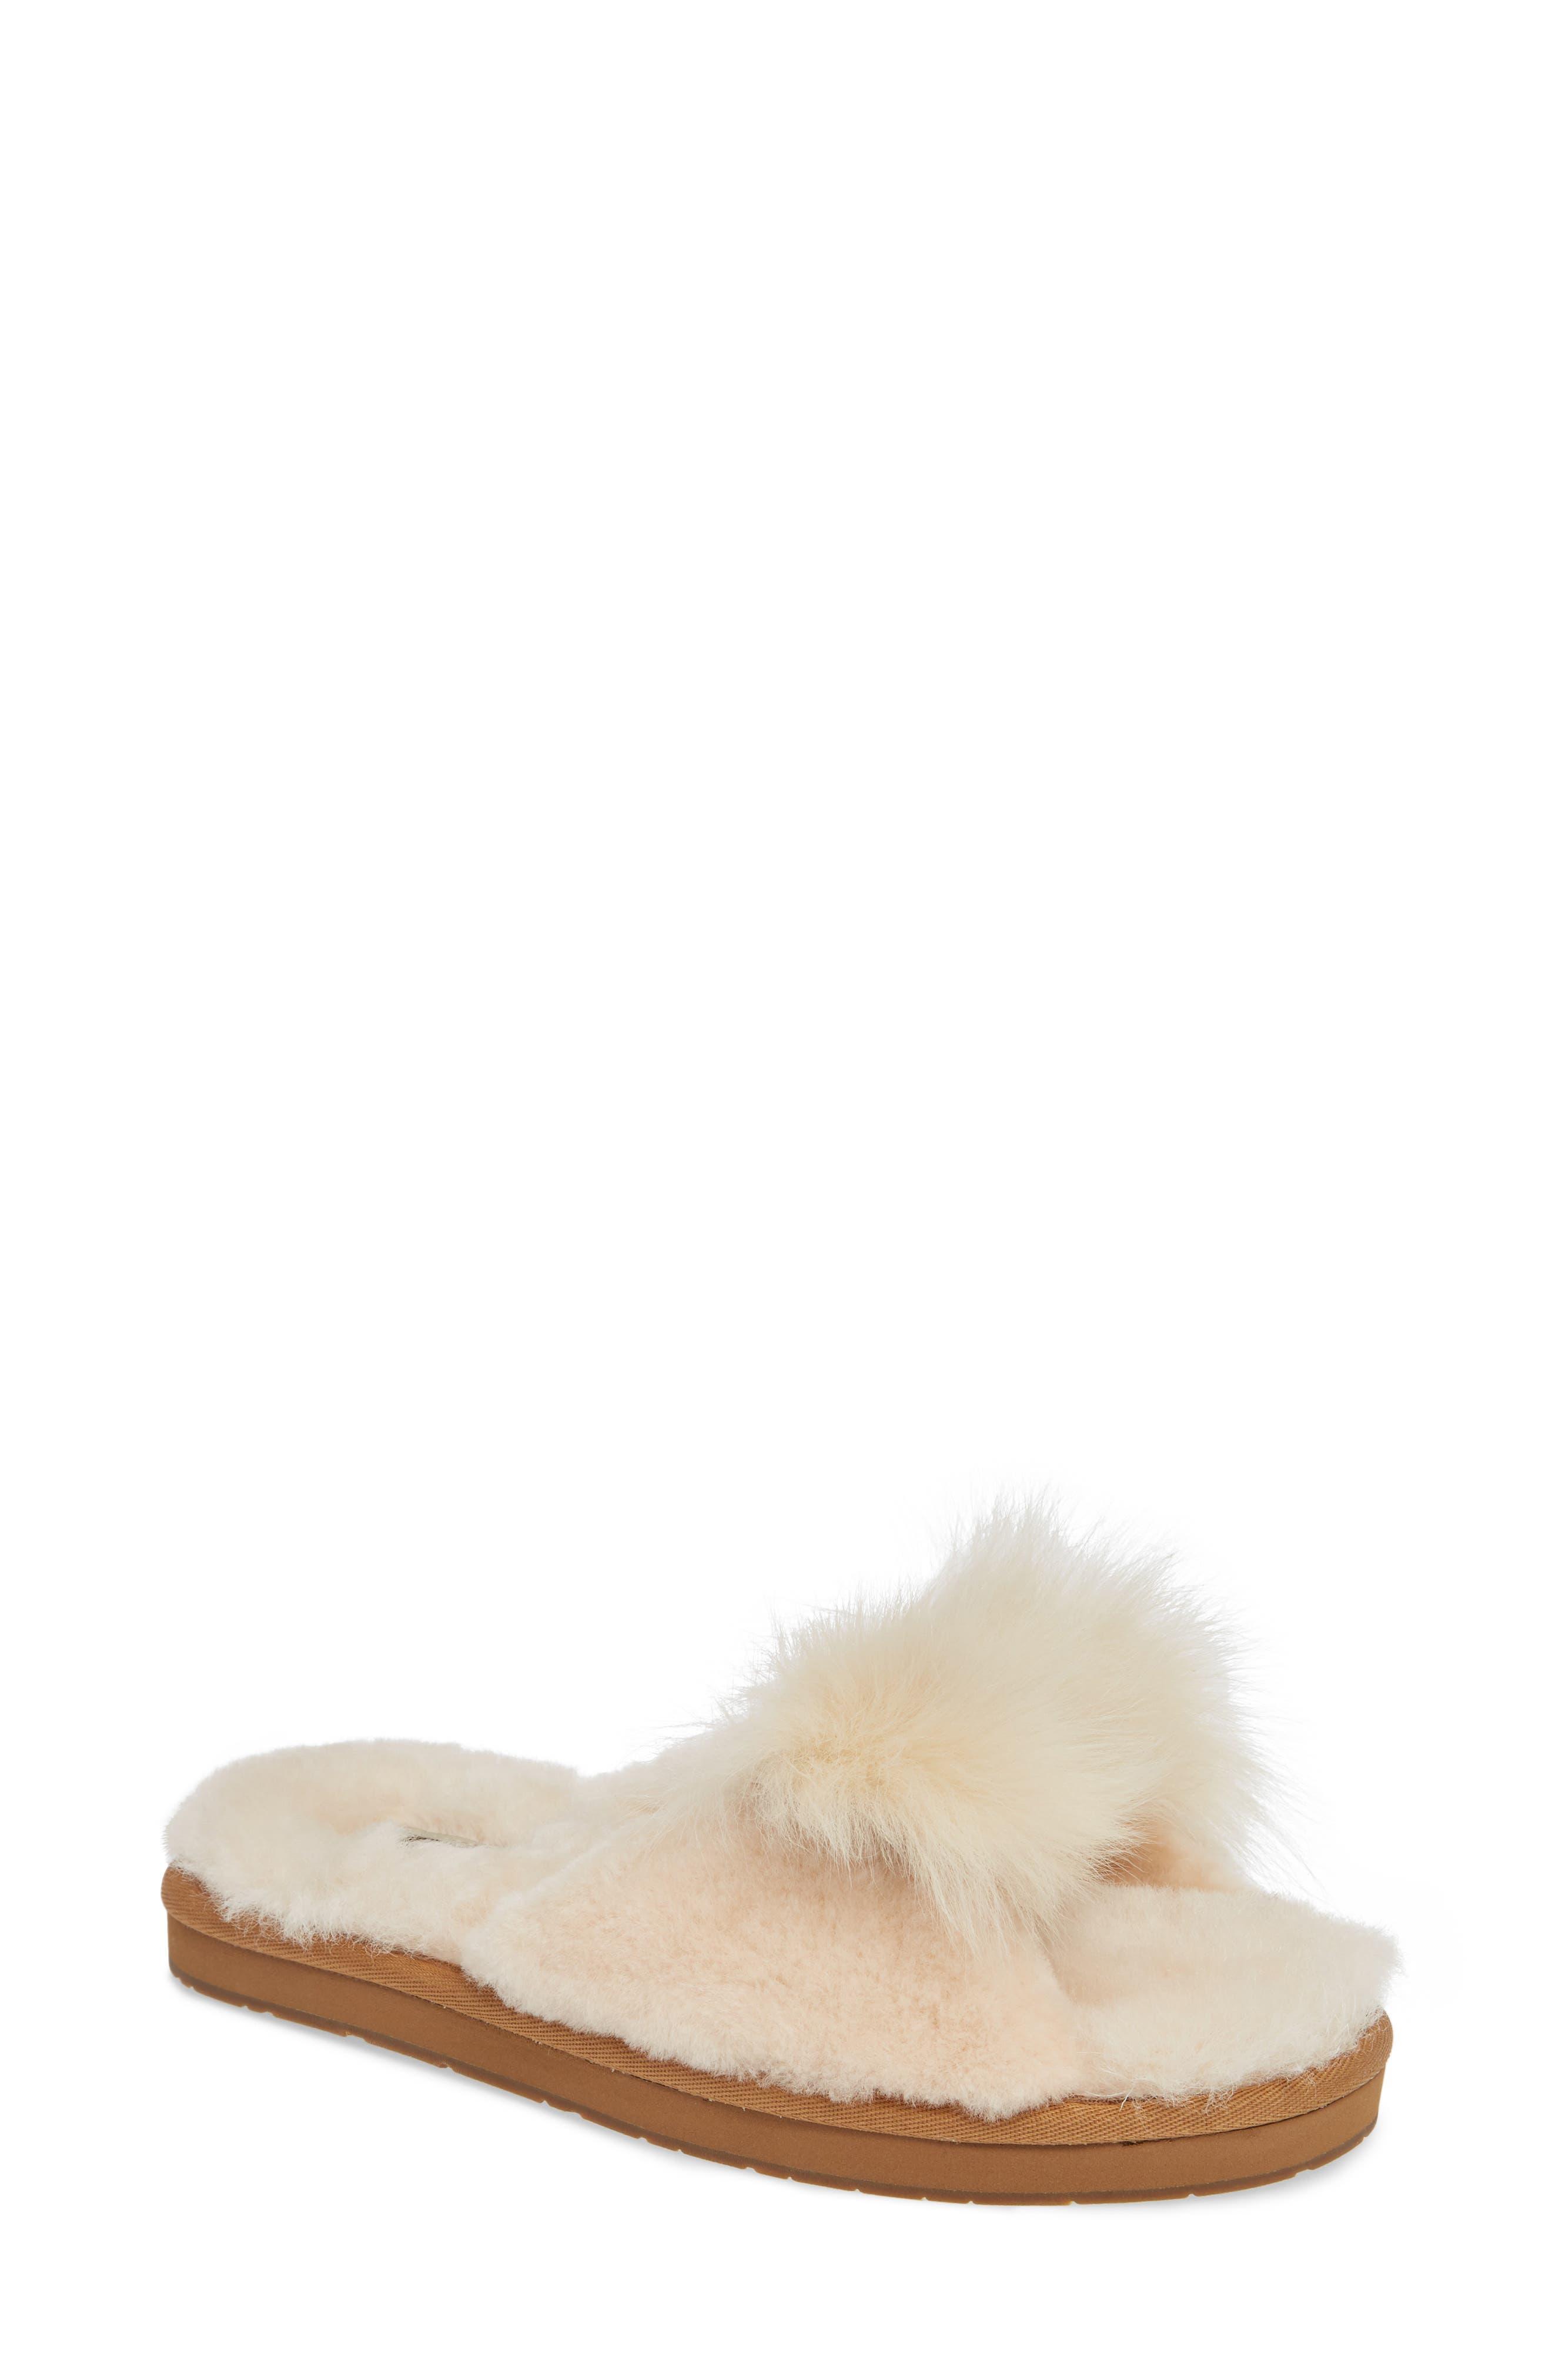 Ugg Mirabelle Genuine Shearling Slipper, Beige